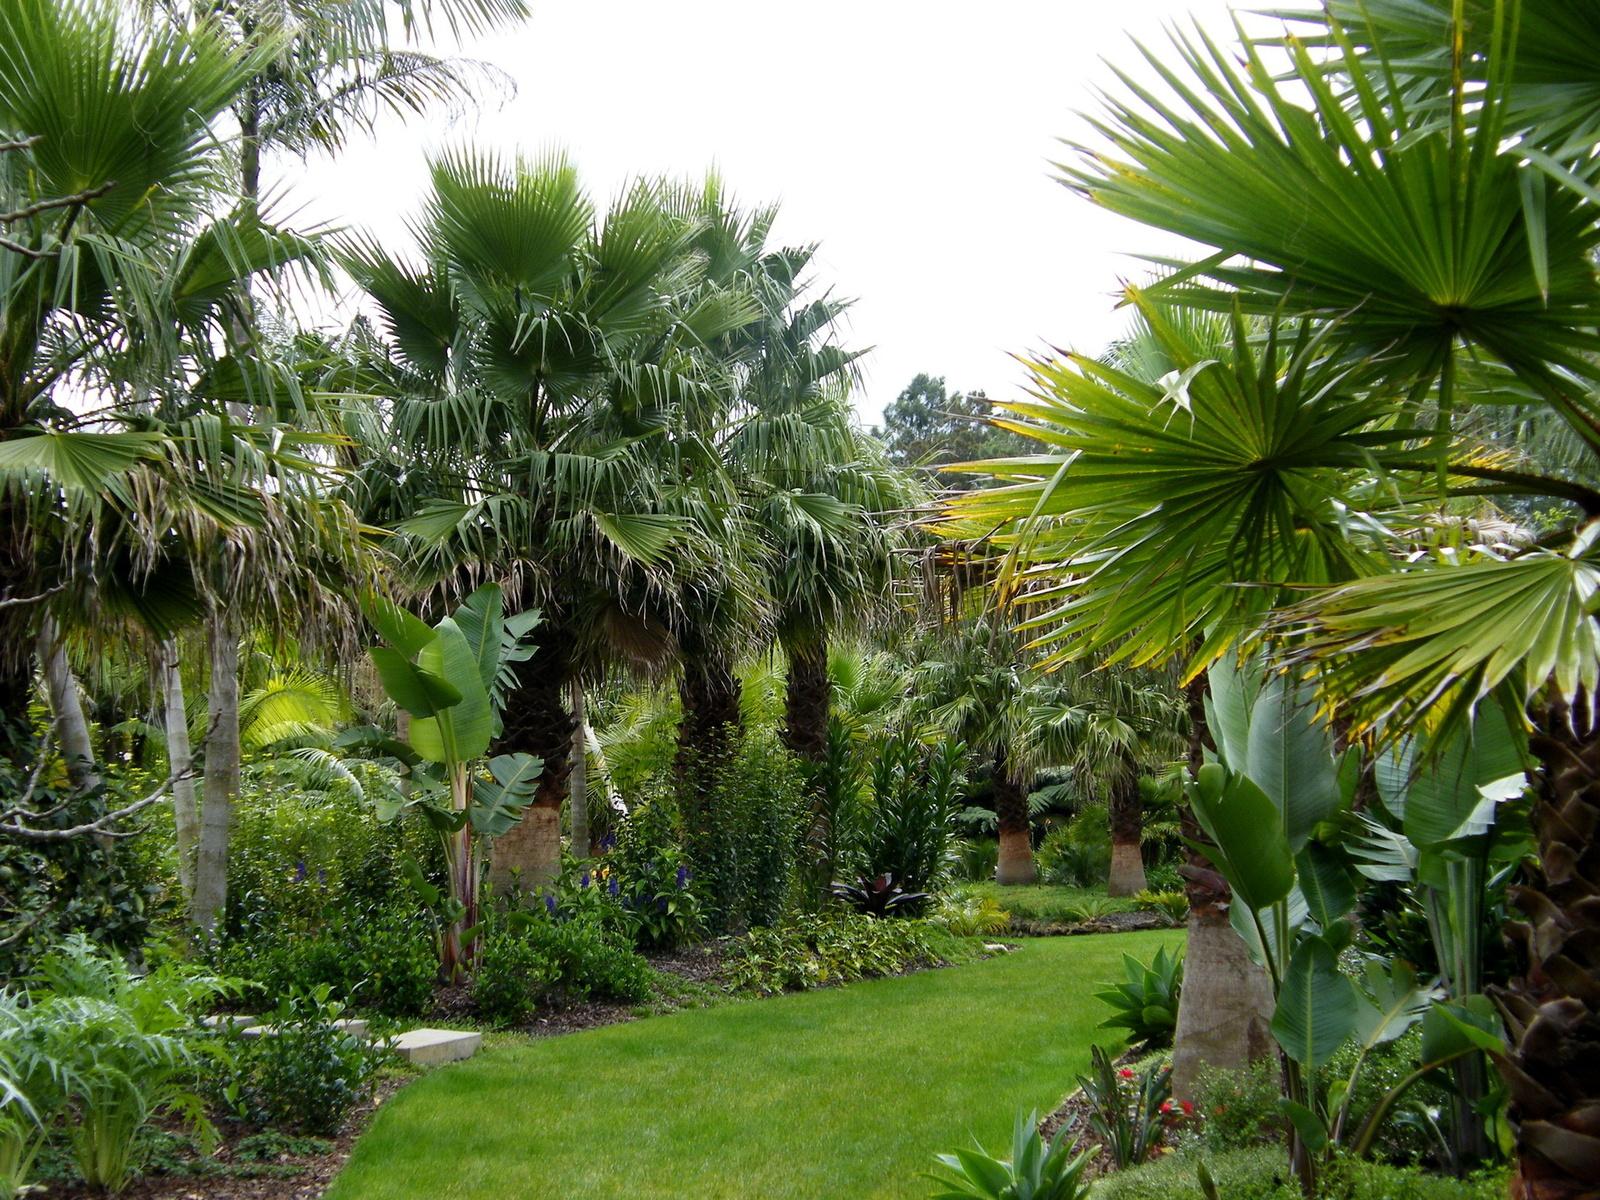 Paisajes lindos con jardines imagui for Jardines con palmeras